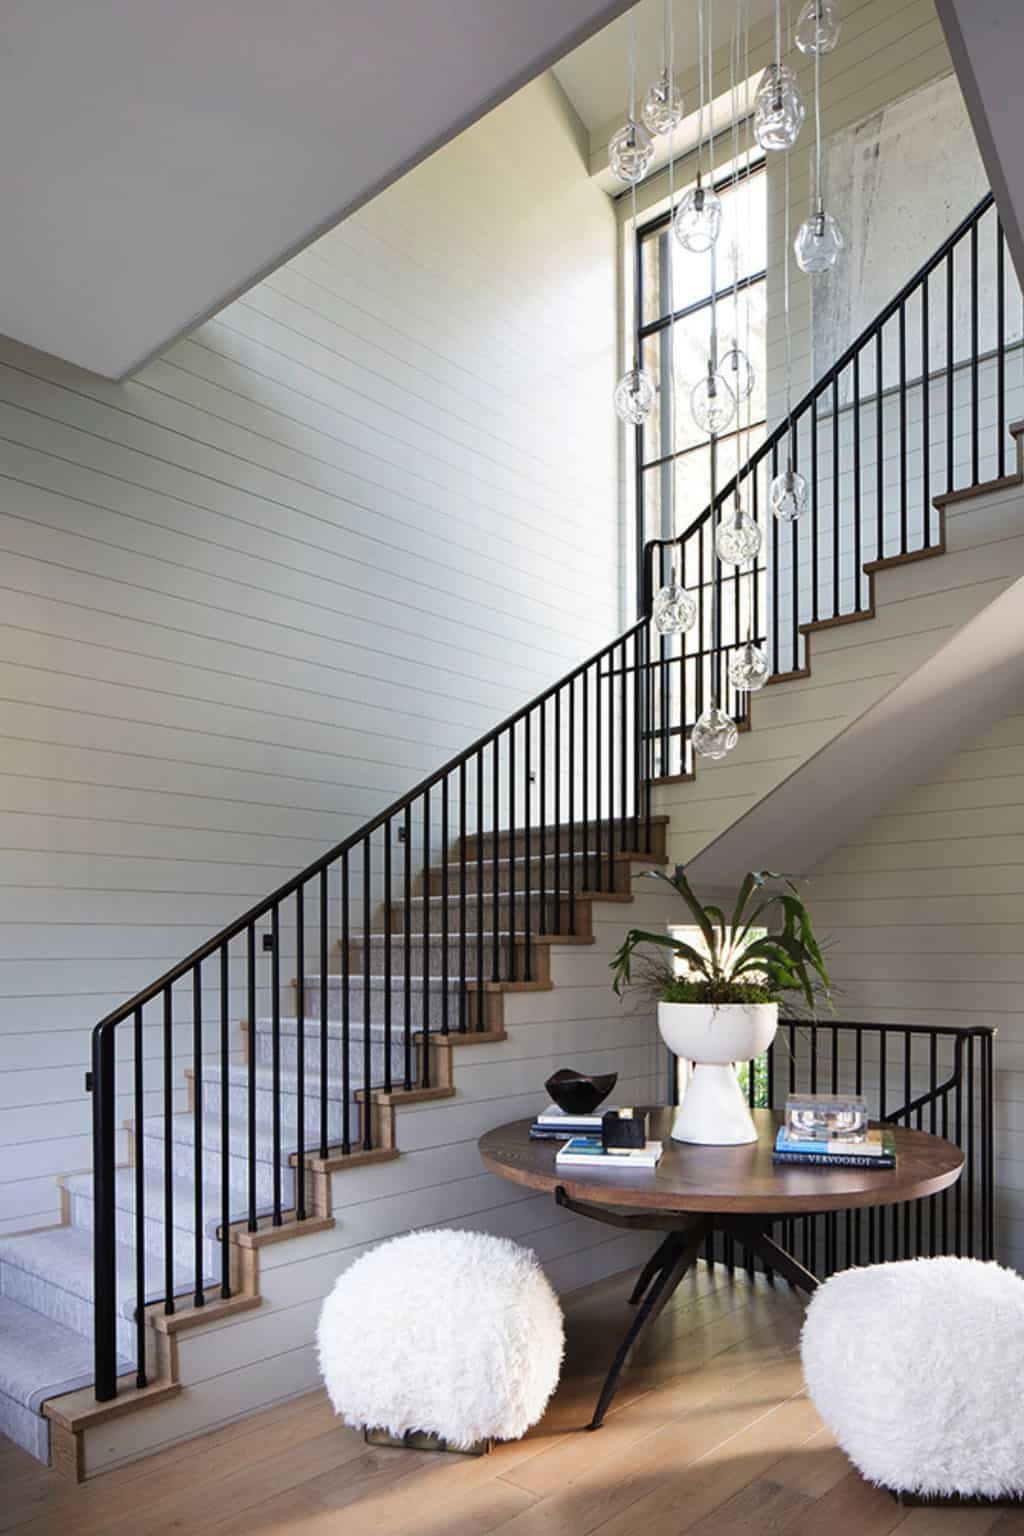 escalier-style transitionnel